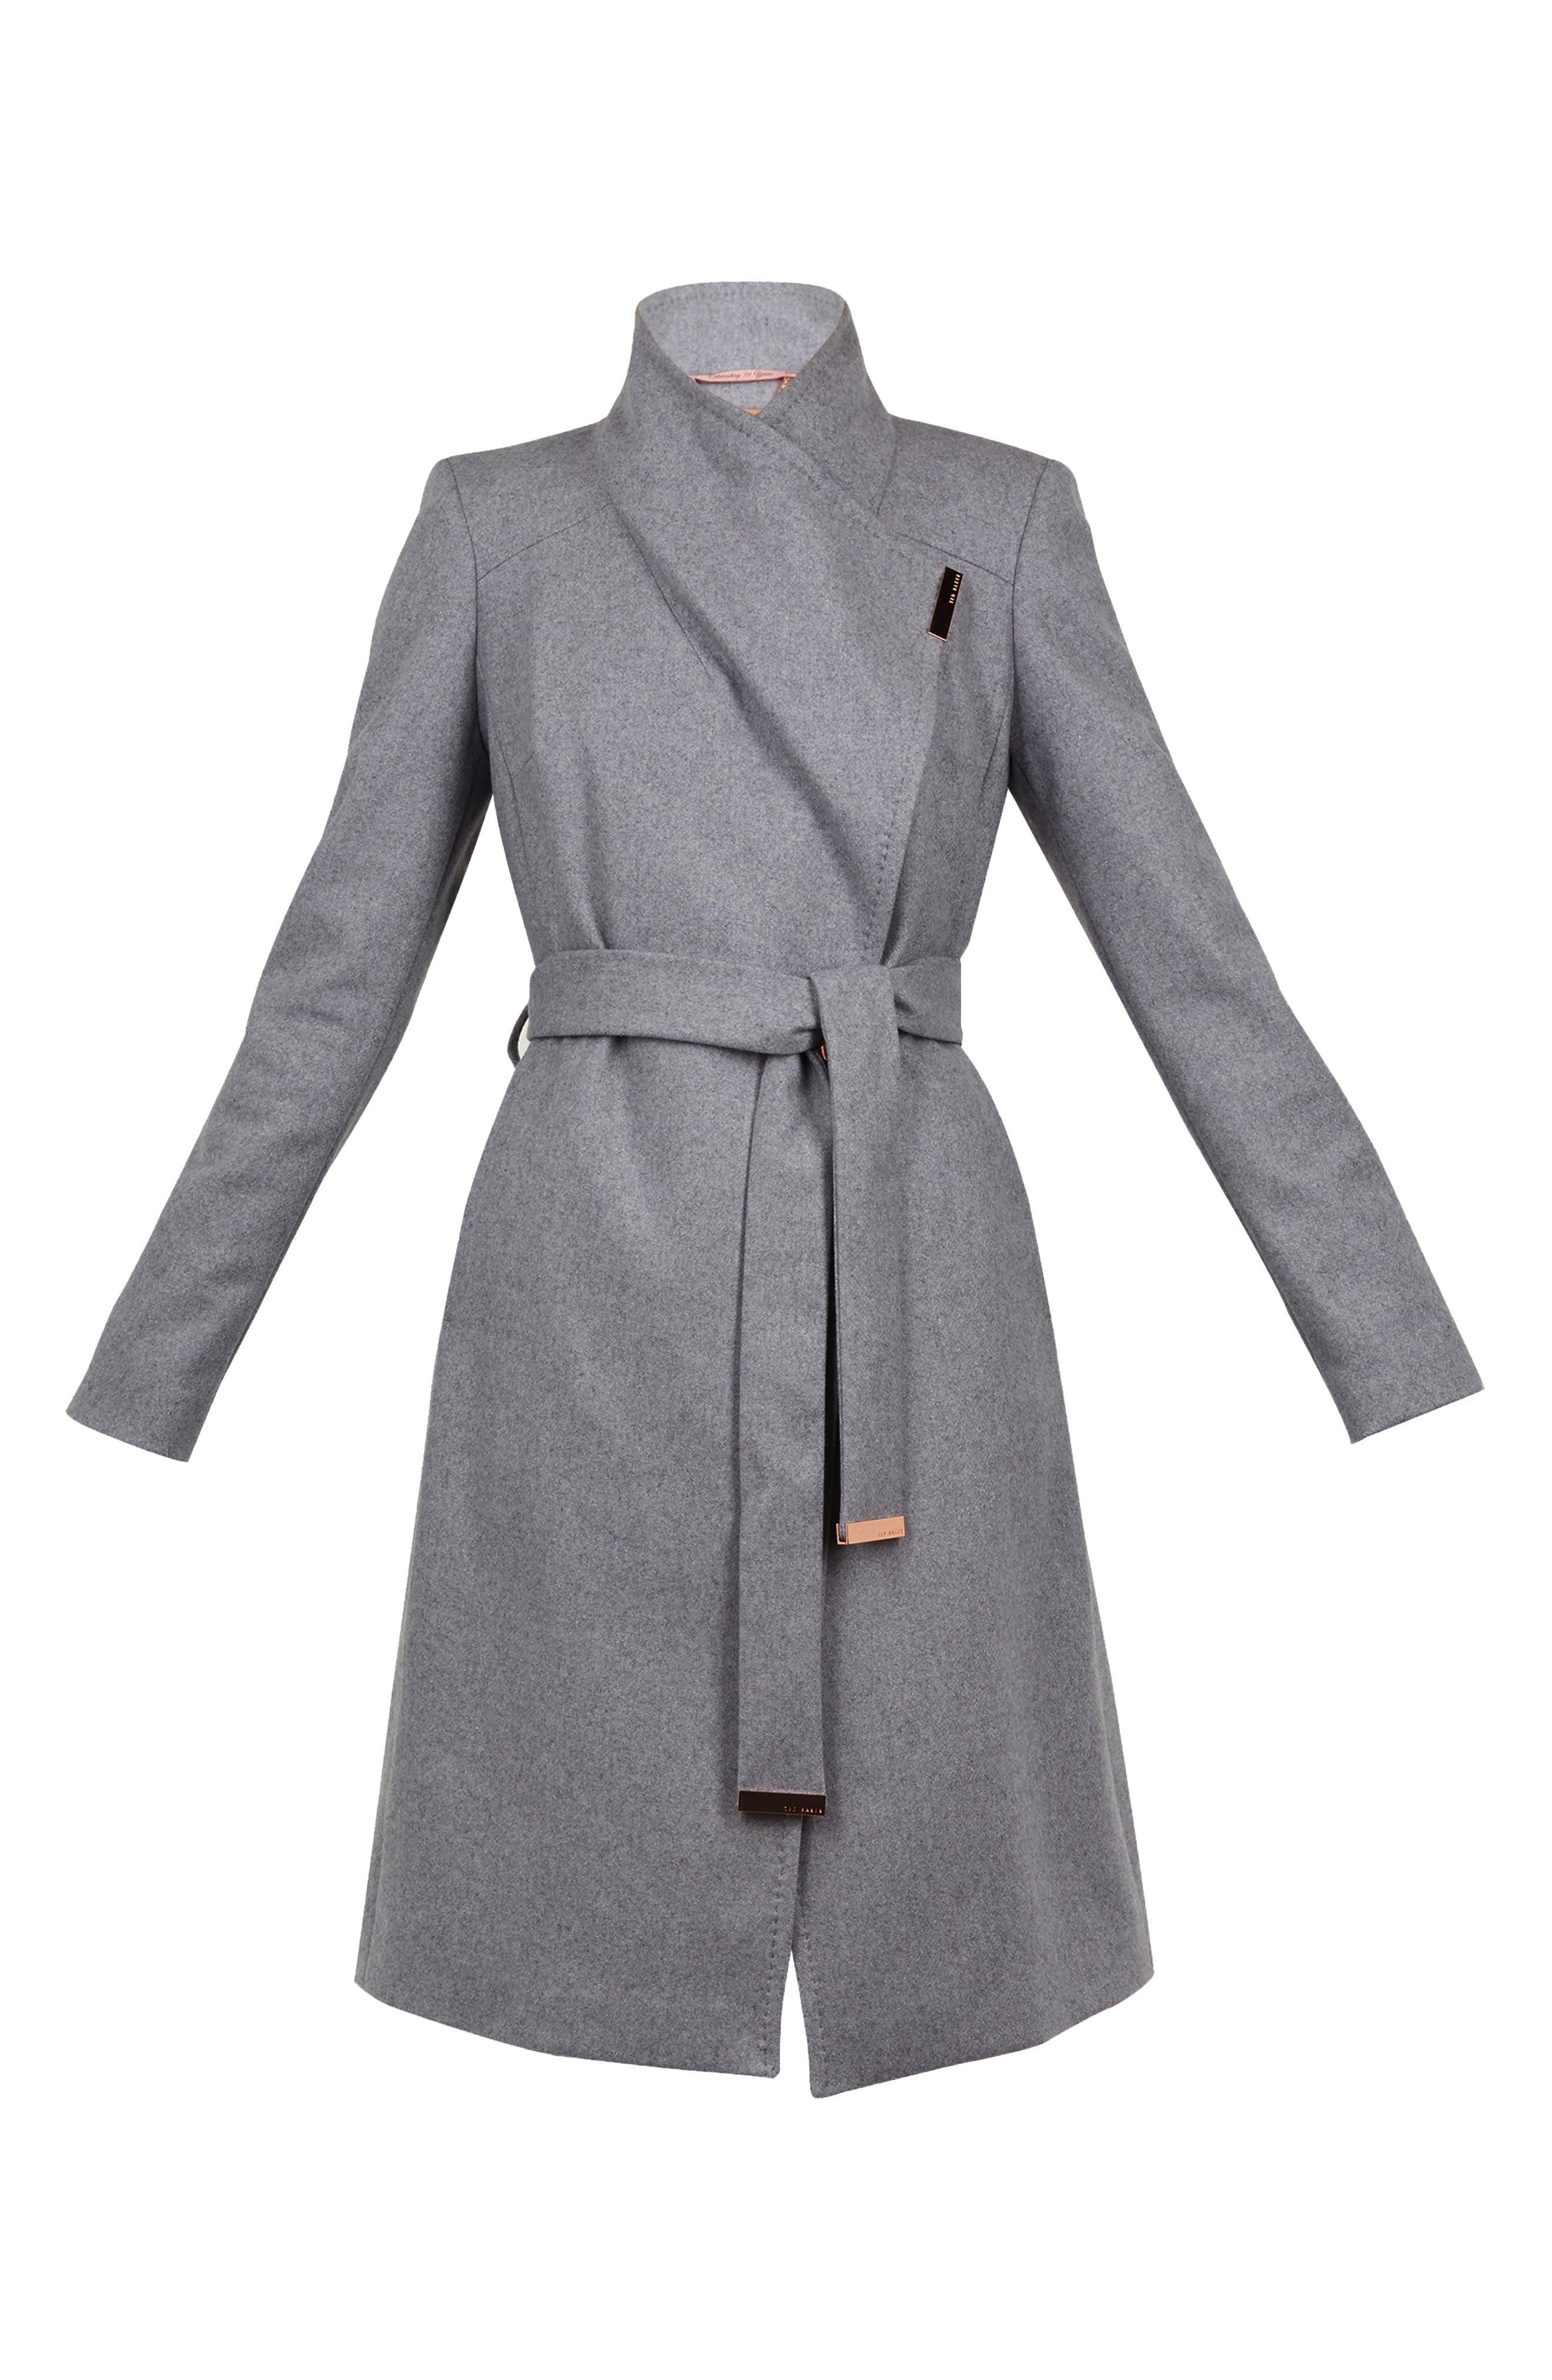 TED BAKER LONDON, Wool Blend Long Wrap Coat, Alternate thumbnail 6, color, 030